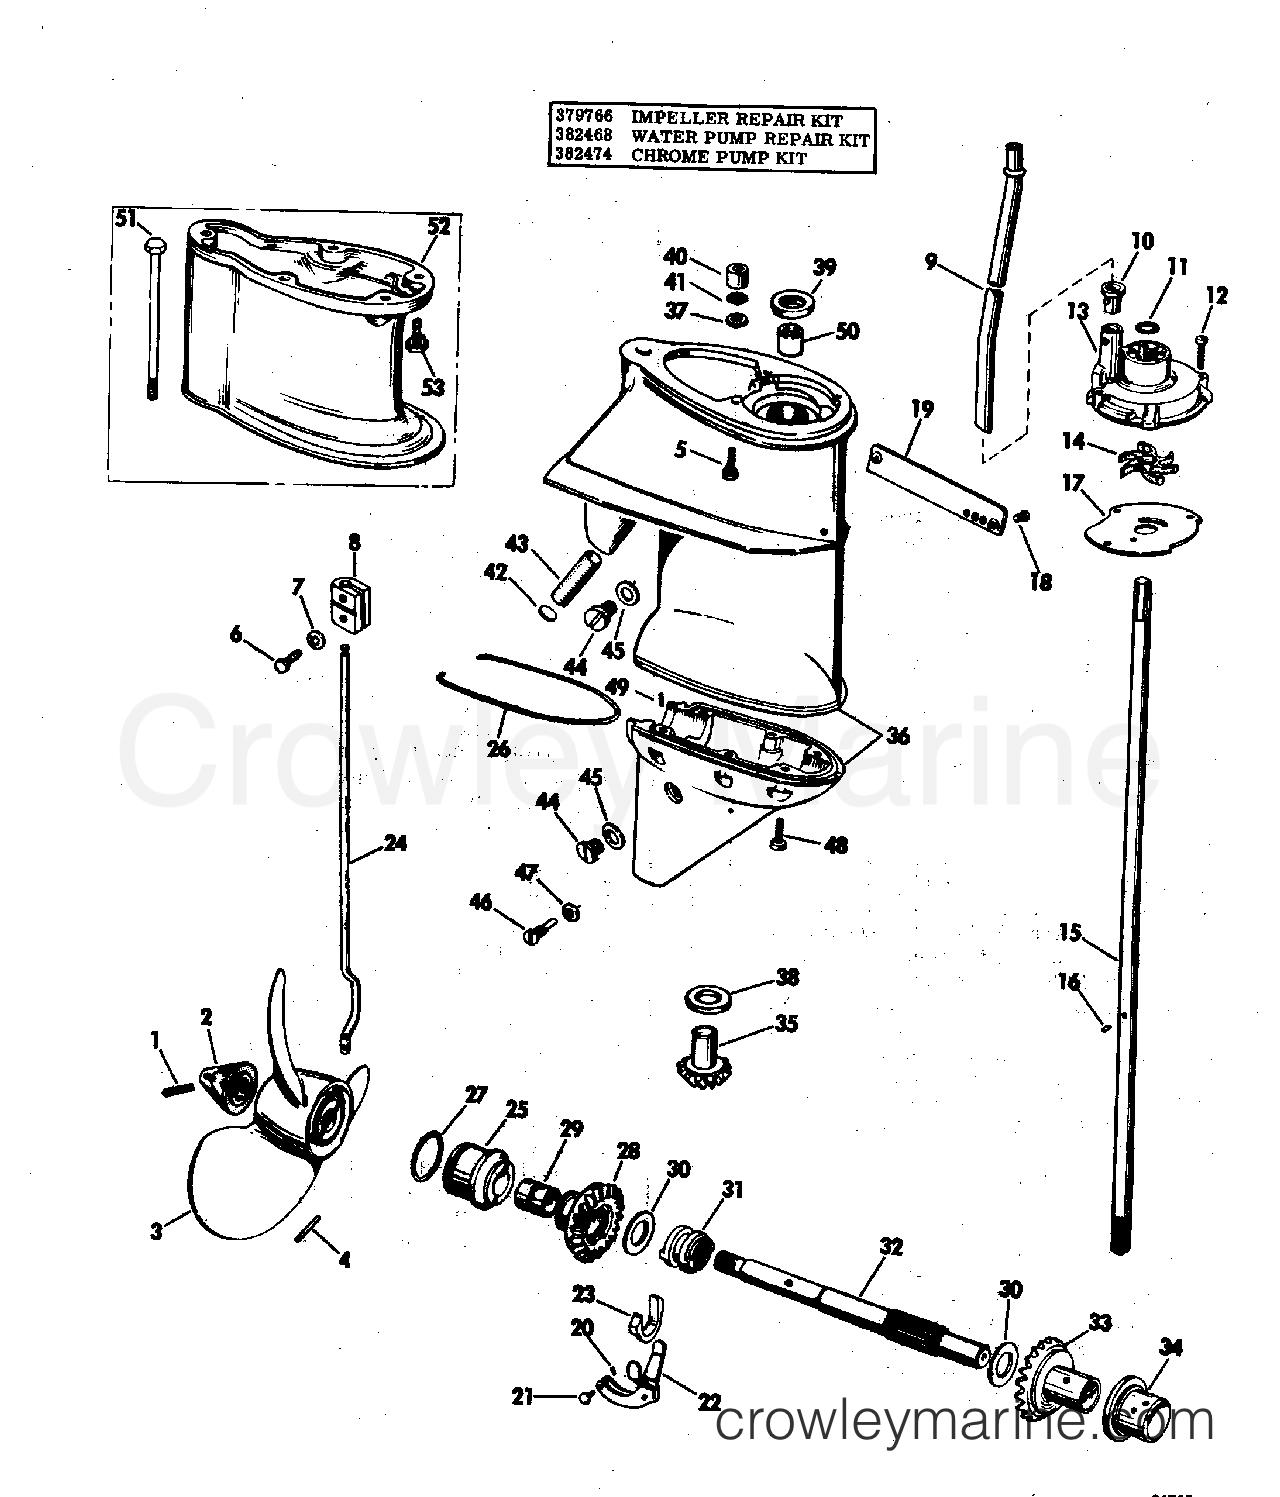 35 hp johnson bedradings schema schematic